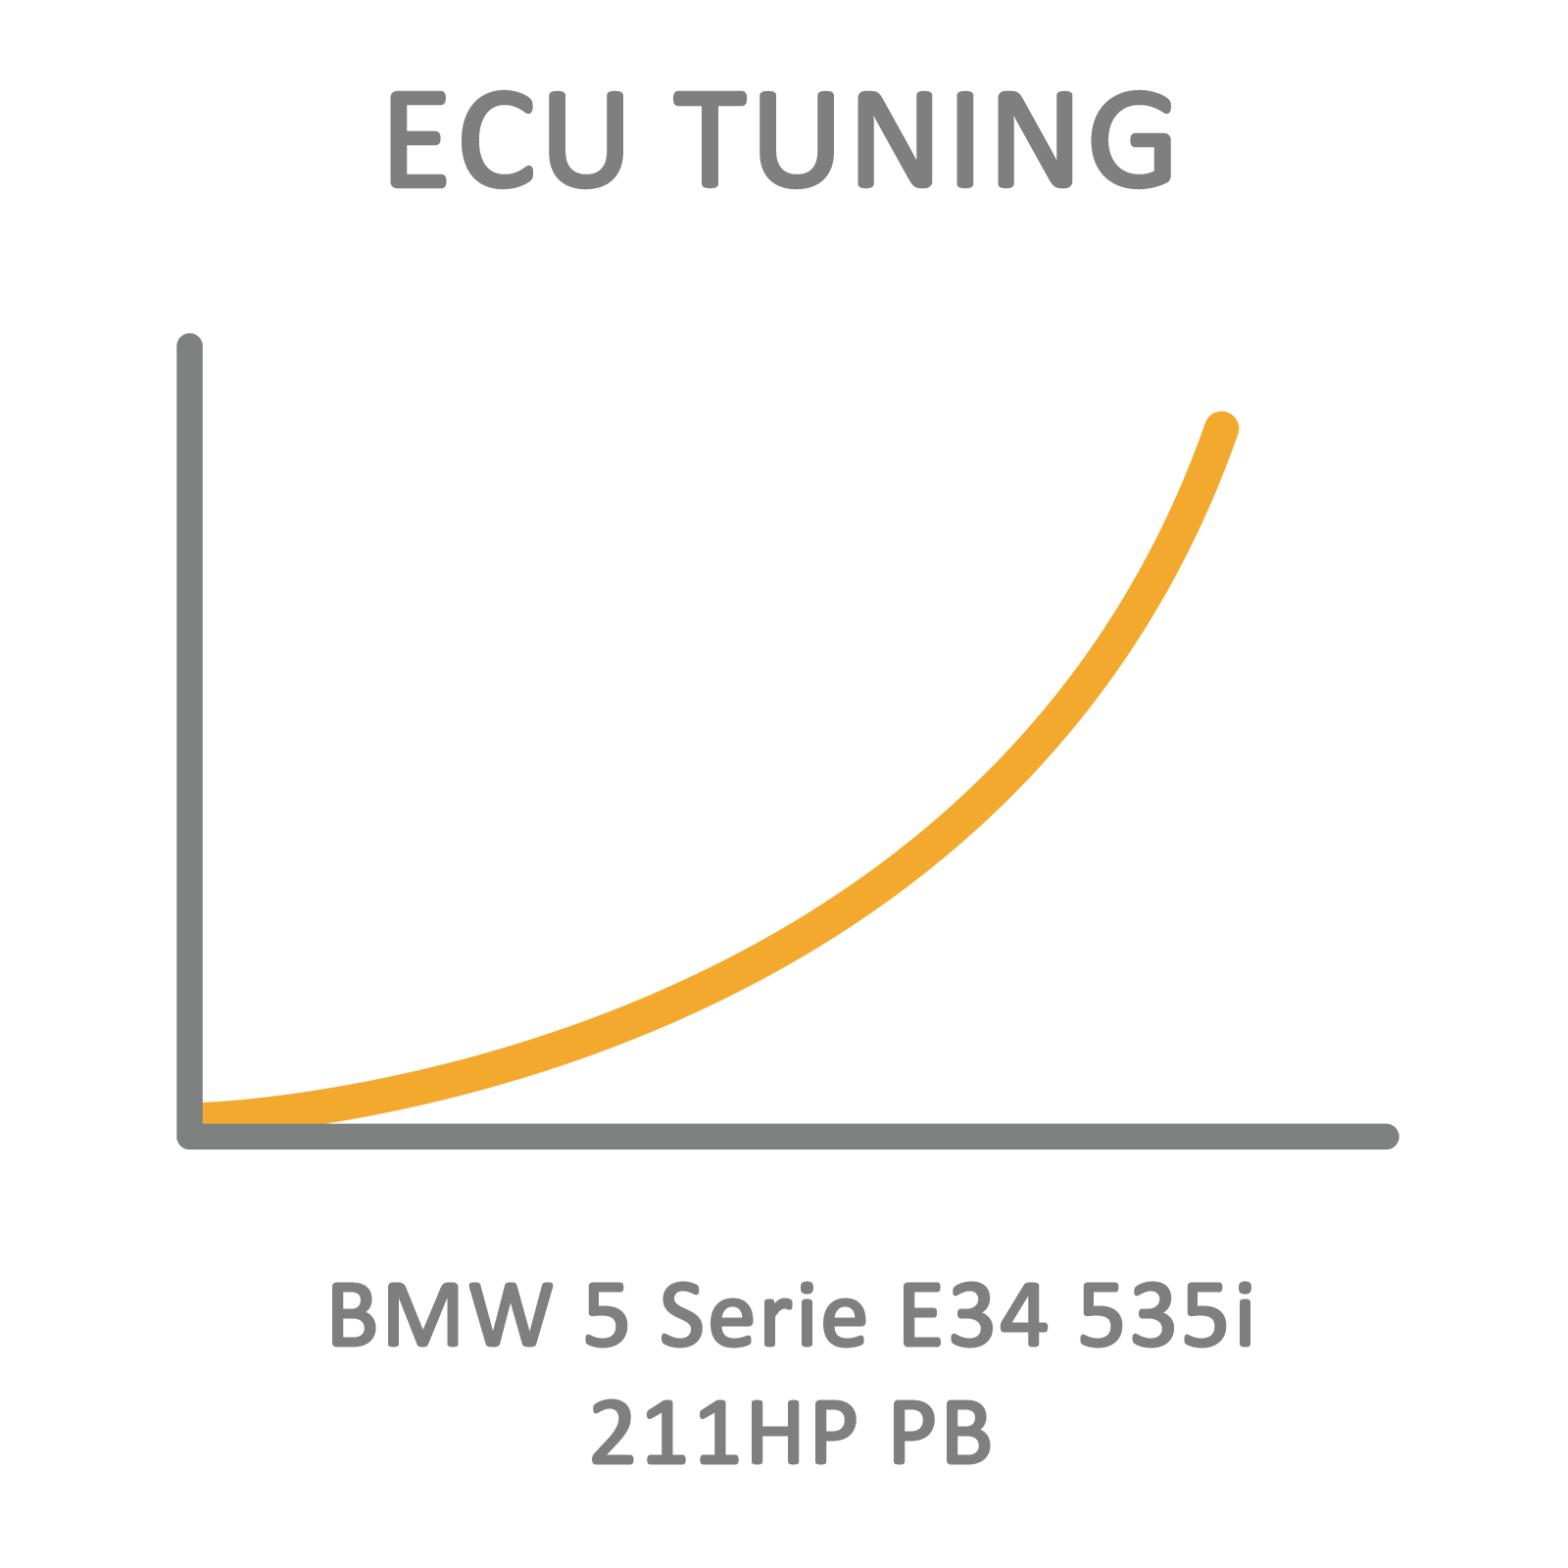 BMW 5 Series E34 535i 211HP PB ECU Tuning Remapping